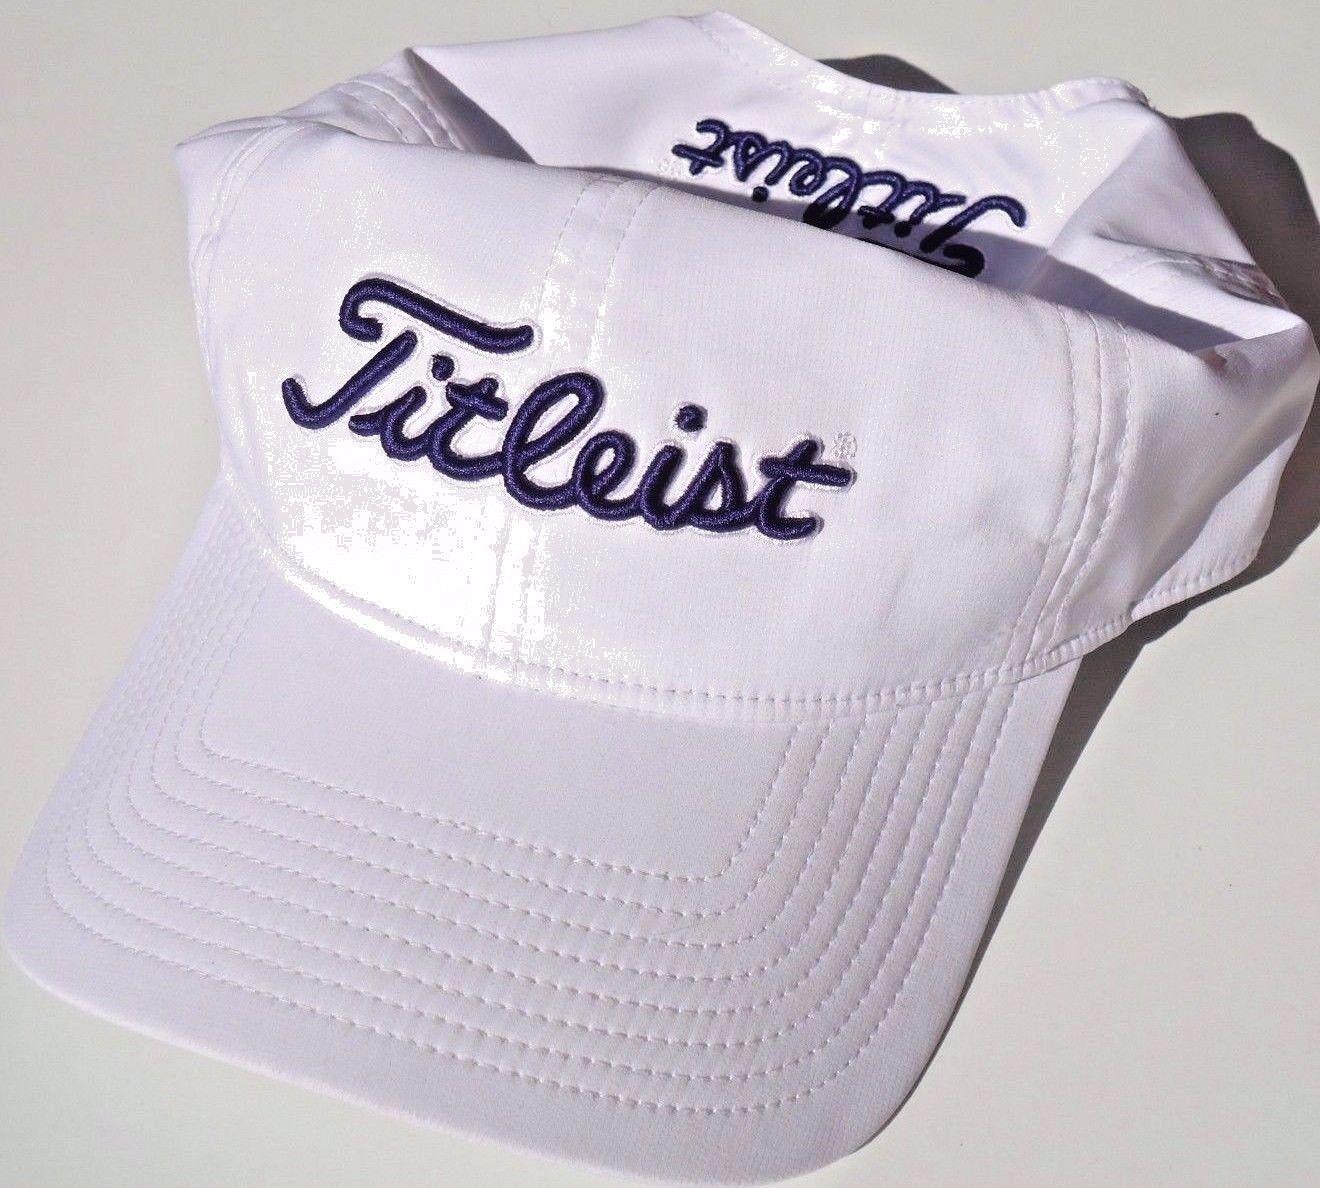 98ad33750 NEW! White/Purple Titleist Women's PRO-V1/FJ and 19 similar items